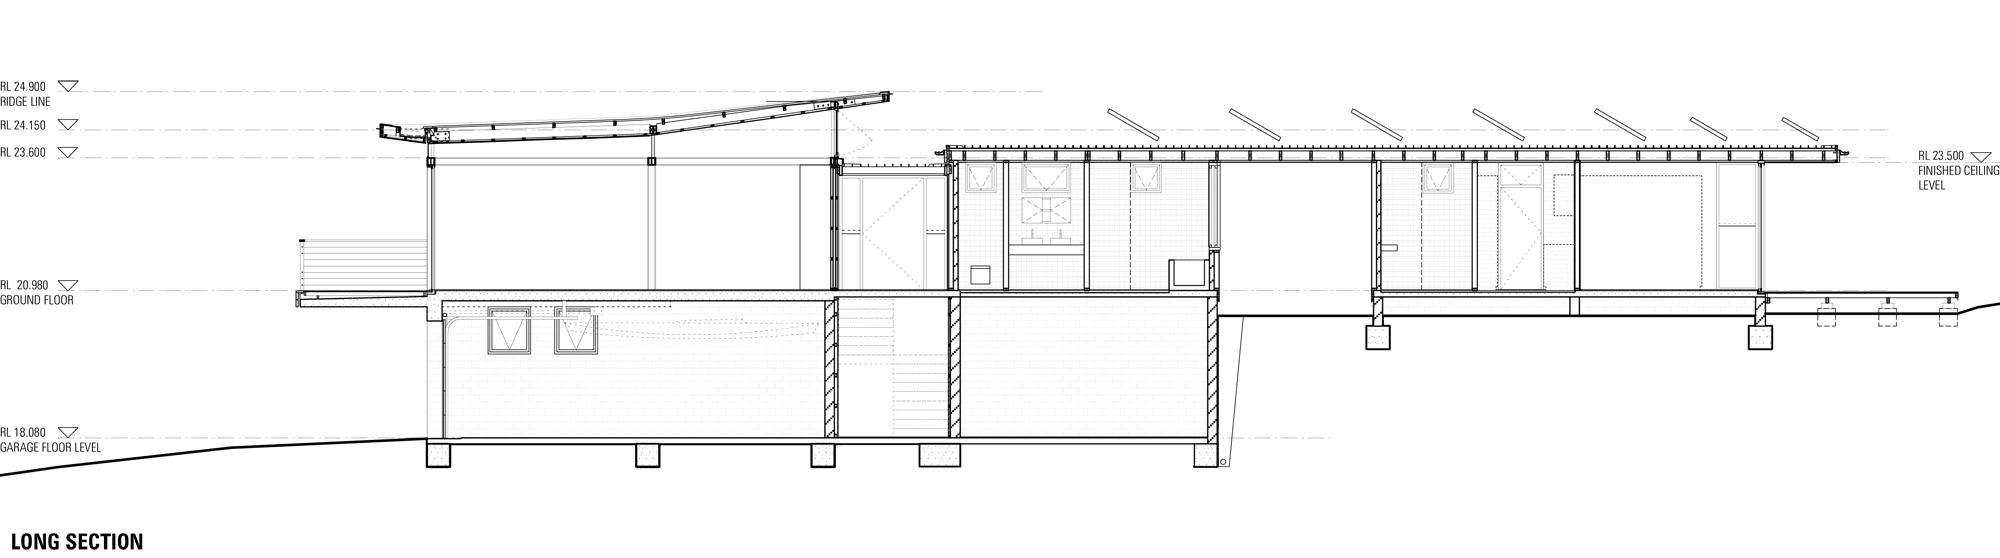 Dwg 11-Sec-Long long section